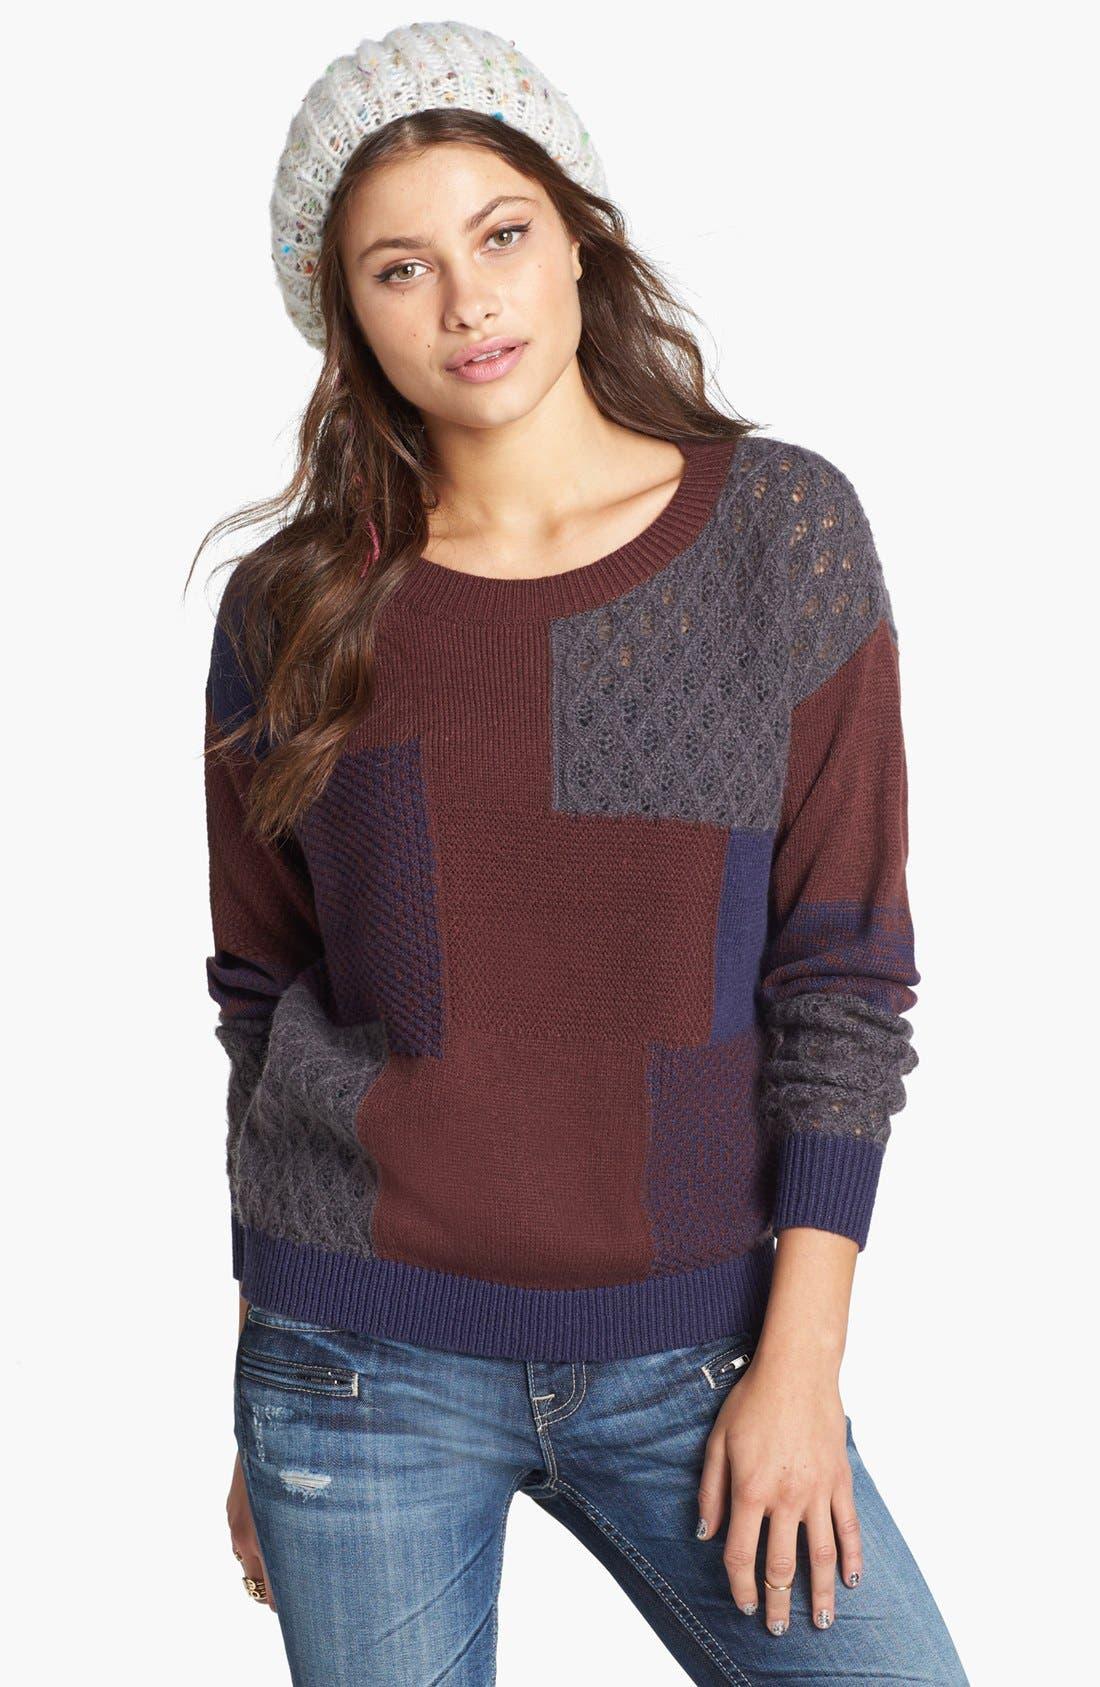 Alternate Image 1 Selected - Rubbish® Mixed Pattern Sweater (Juniors)